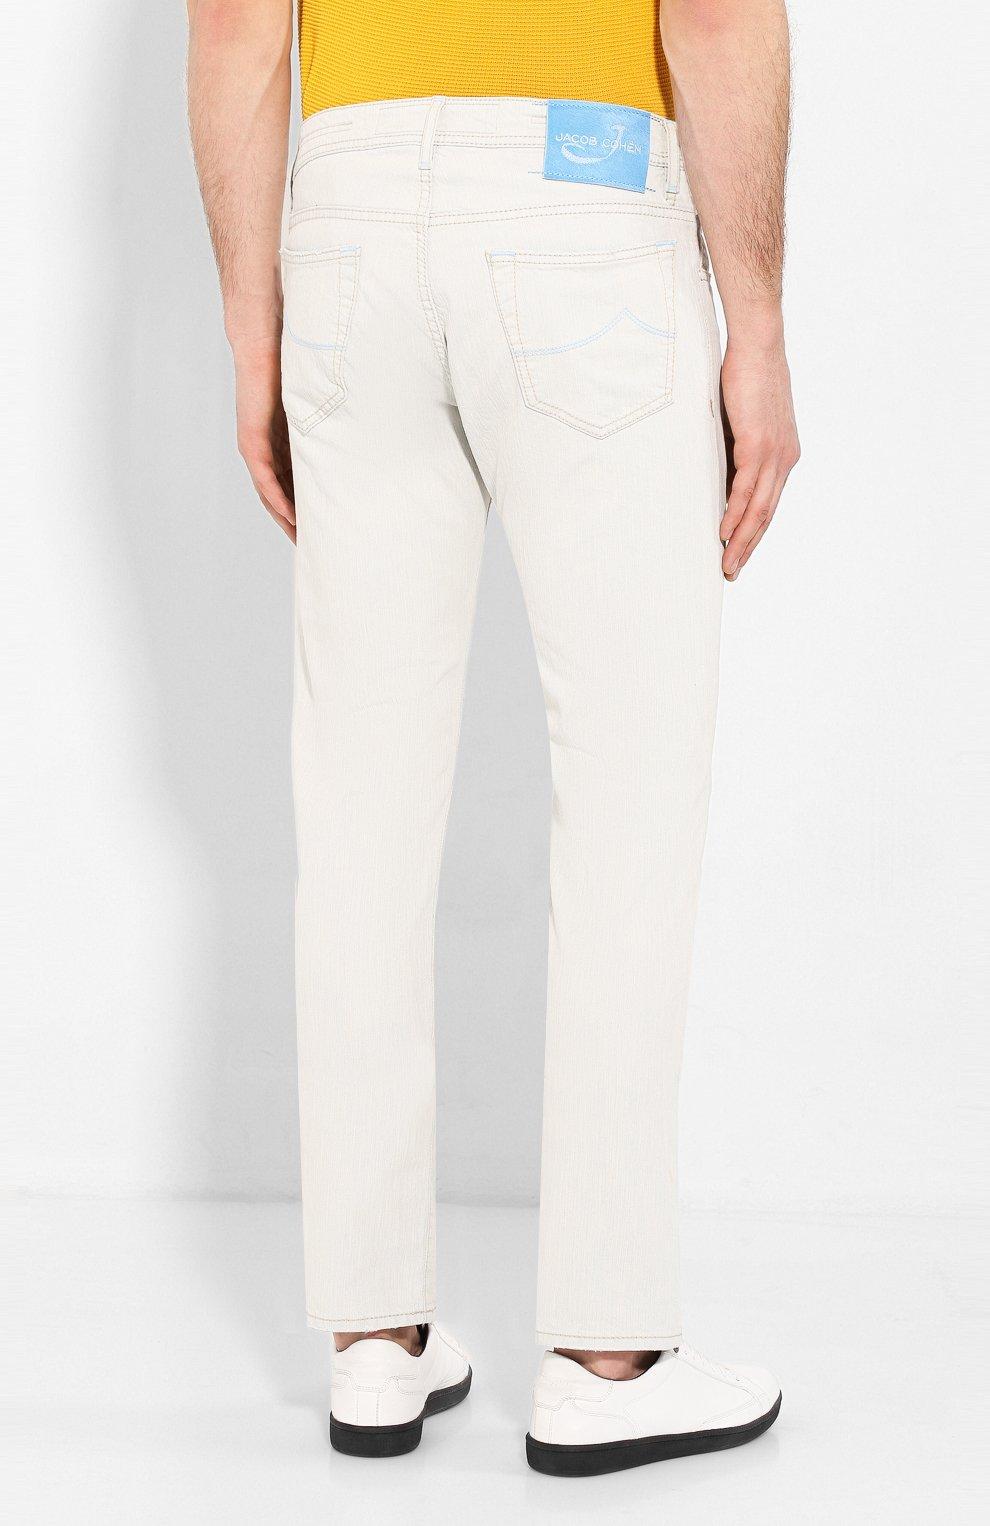 Мужские джинсы JACOB COHEN светло-голубого цвета, арт. J688 C0MF 01539-L/53 | Фото 4